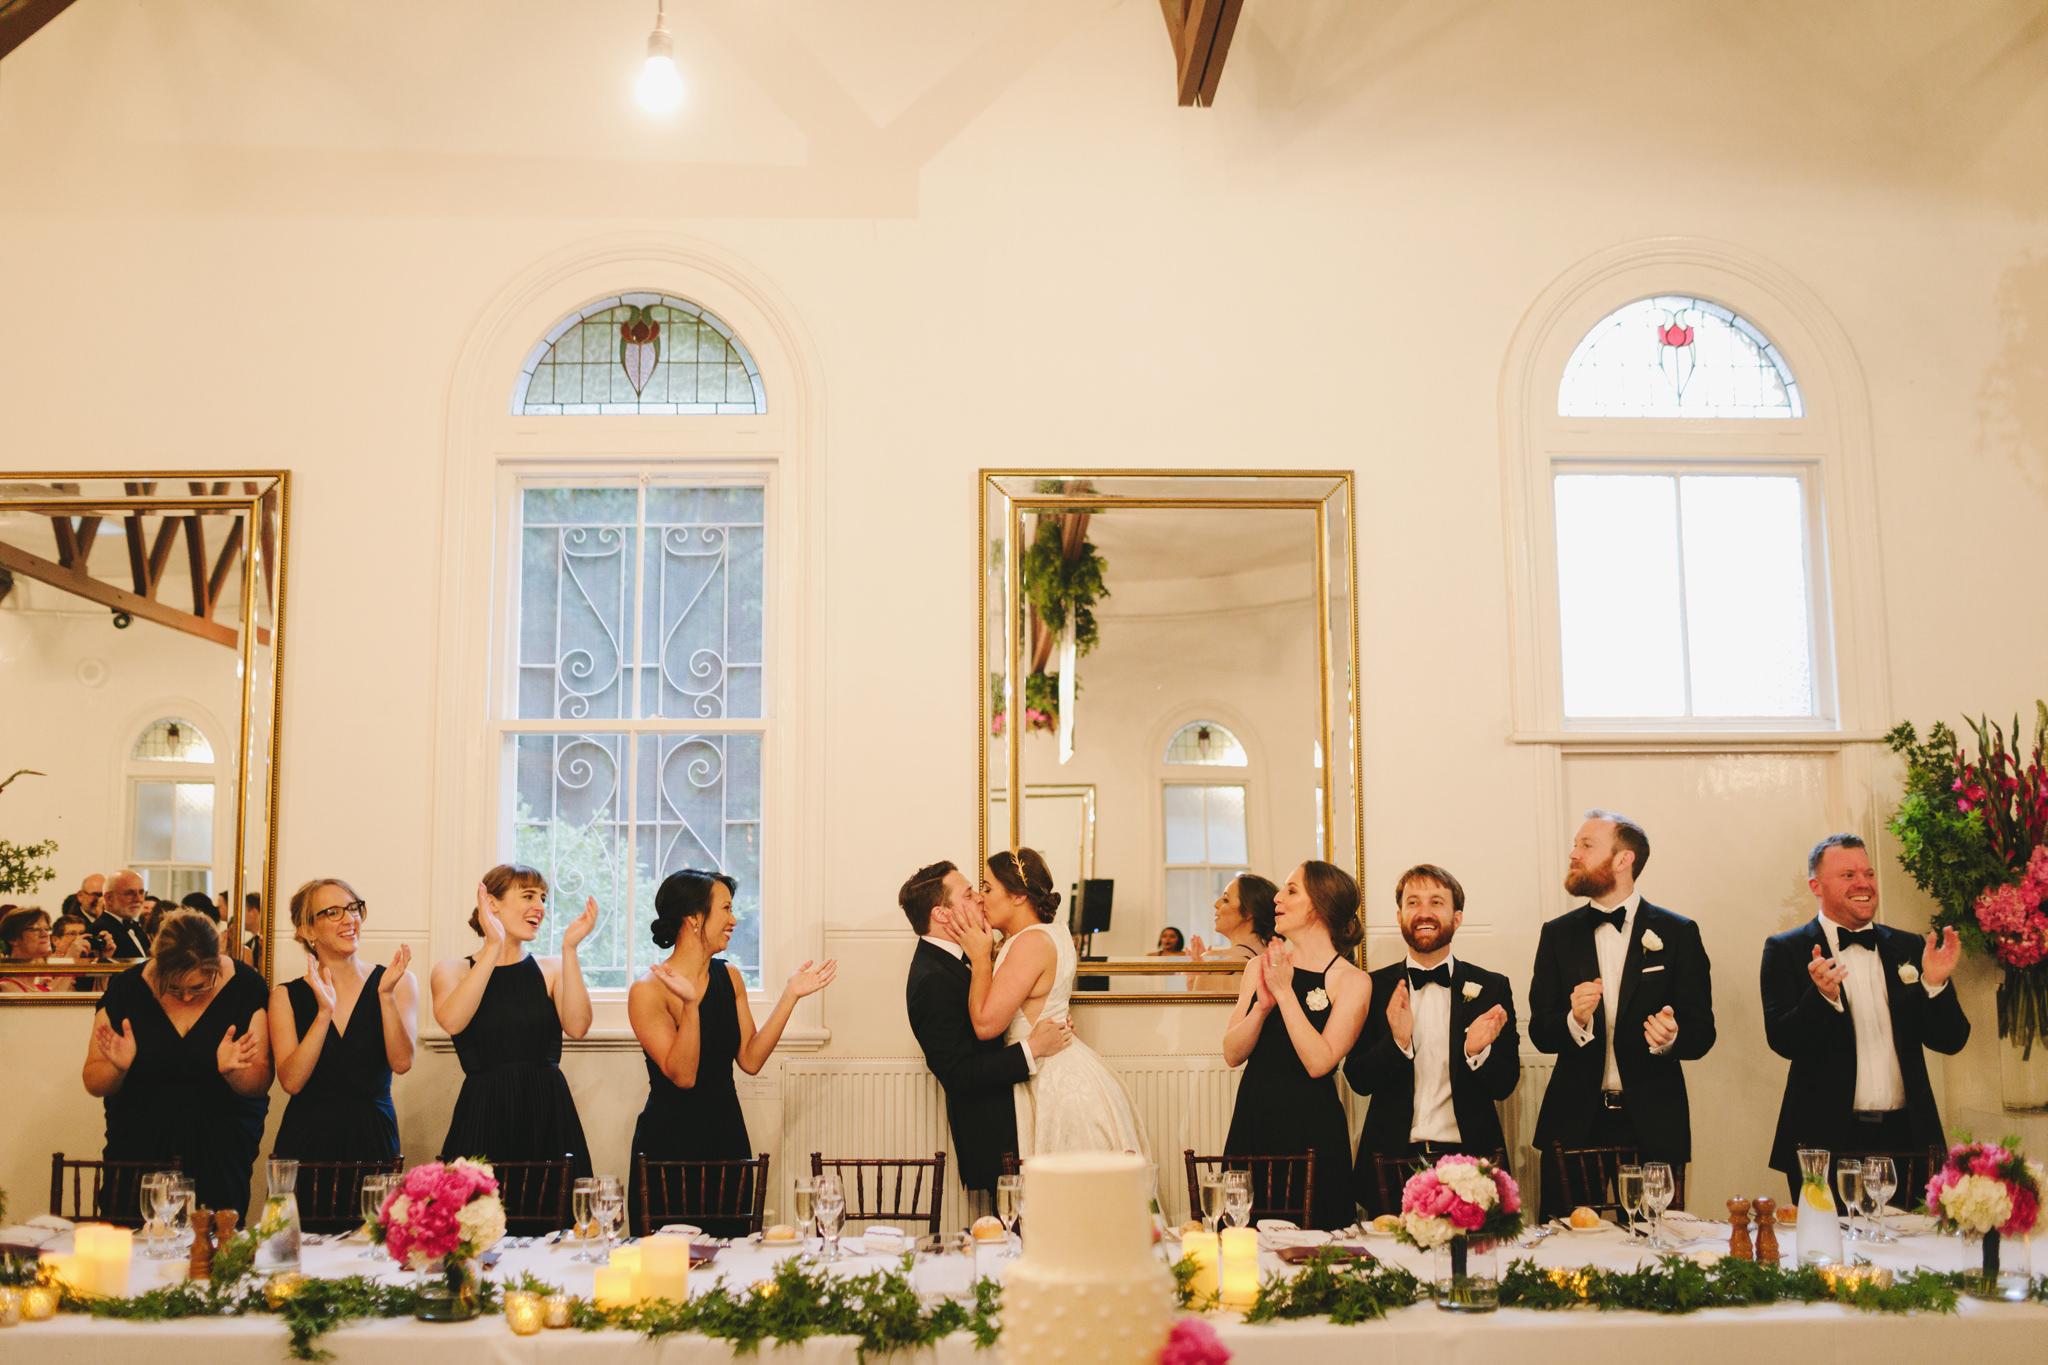 Abbotsford_Convent_Wedding_Peter_Anna099.JPG